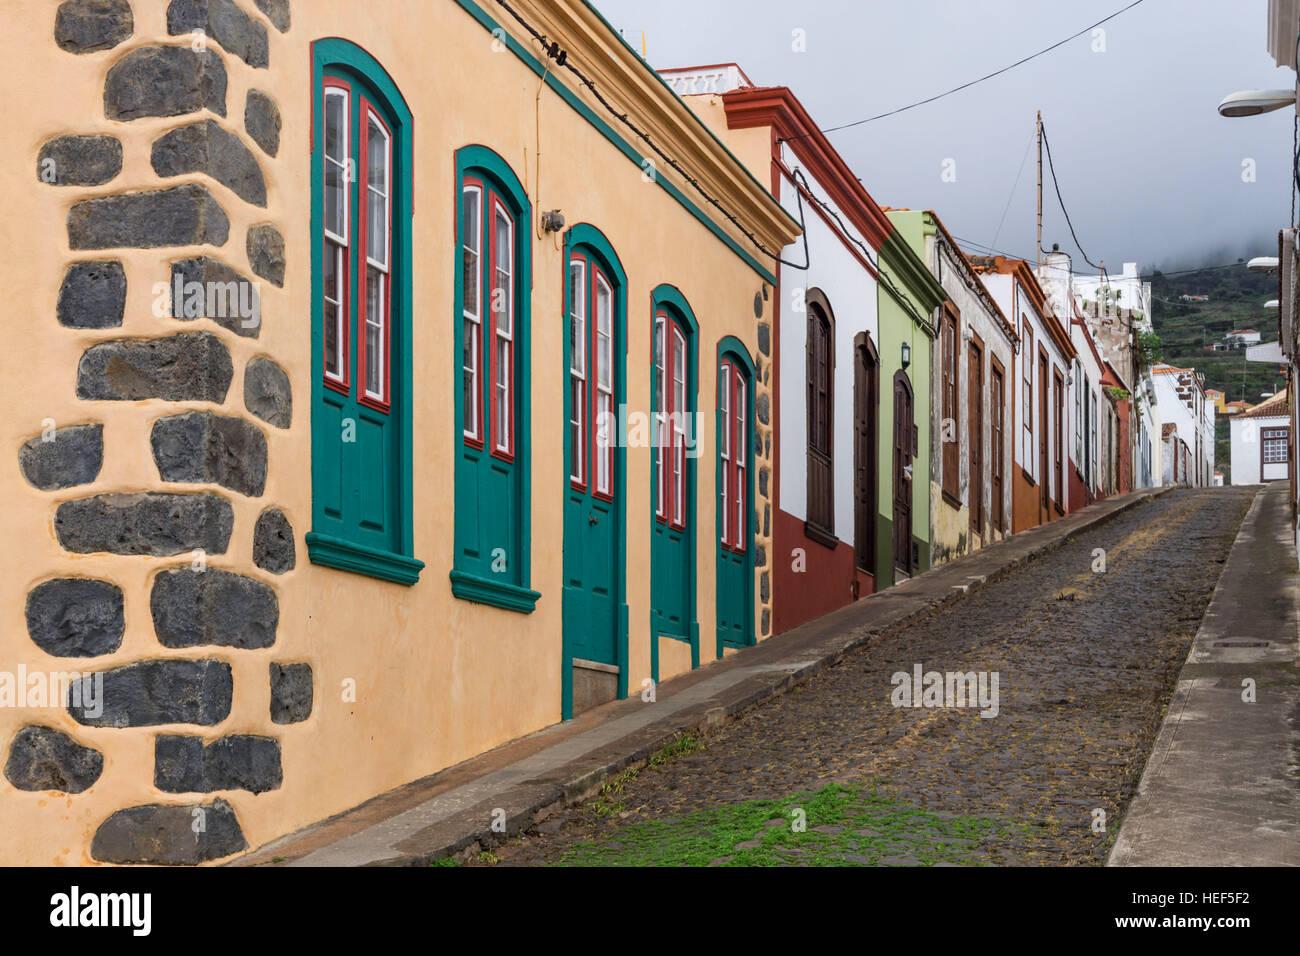 Reihenhäuser in Puntagorda, La Palma, Kanarische Inseln, Spanien Stockfoto